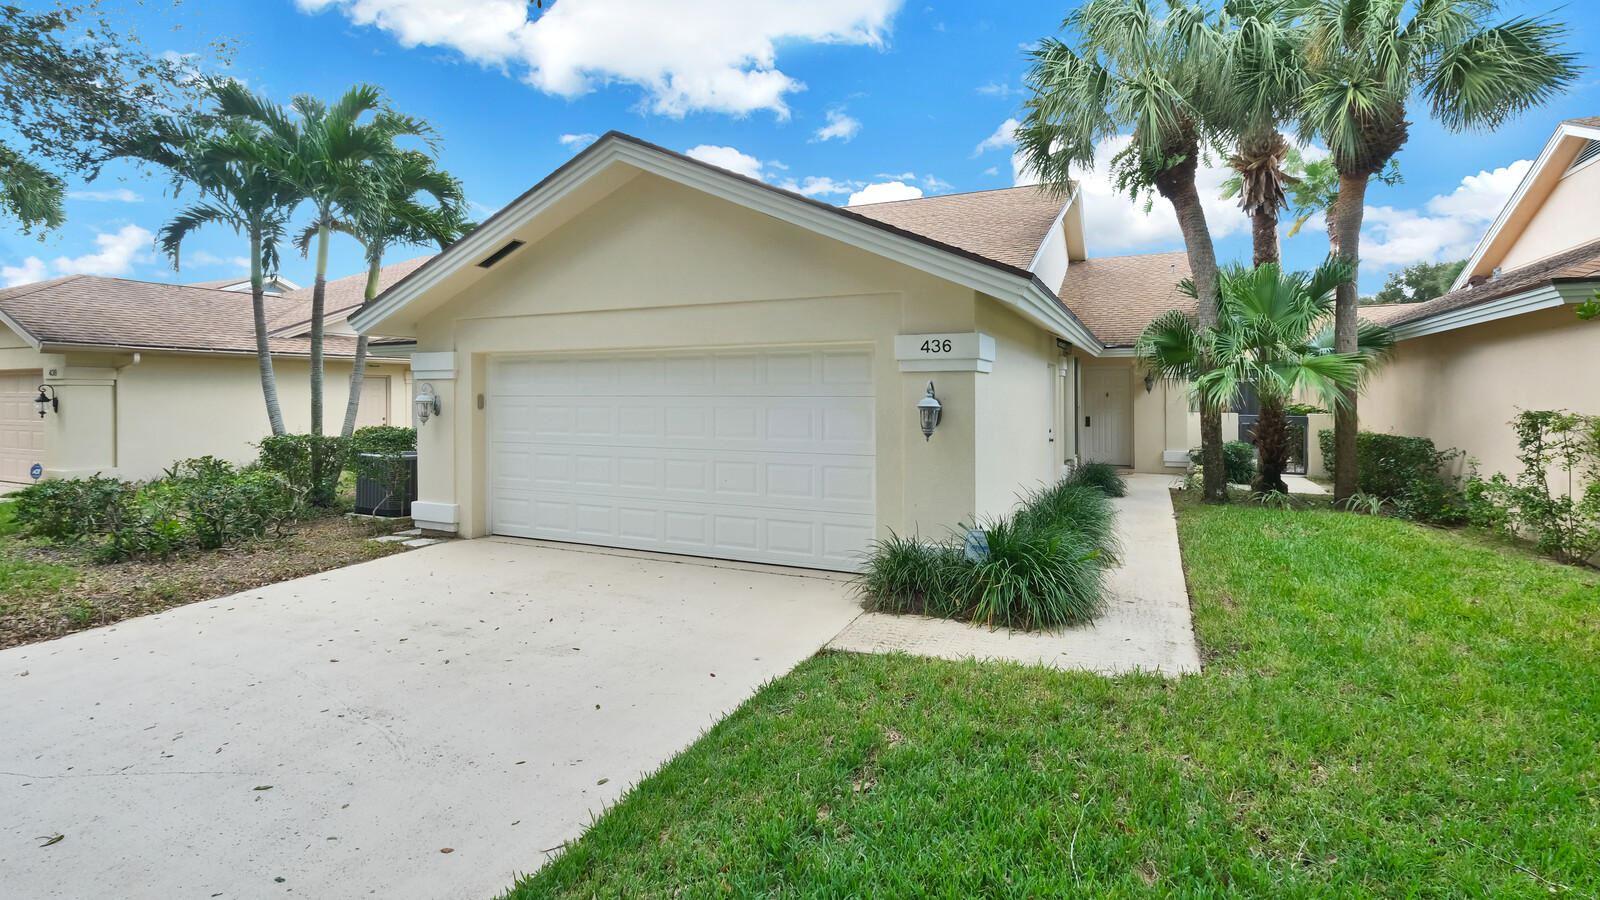 436 River Edge Road, Jupiter, FL 33477 - #: RX-10673356